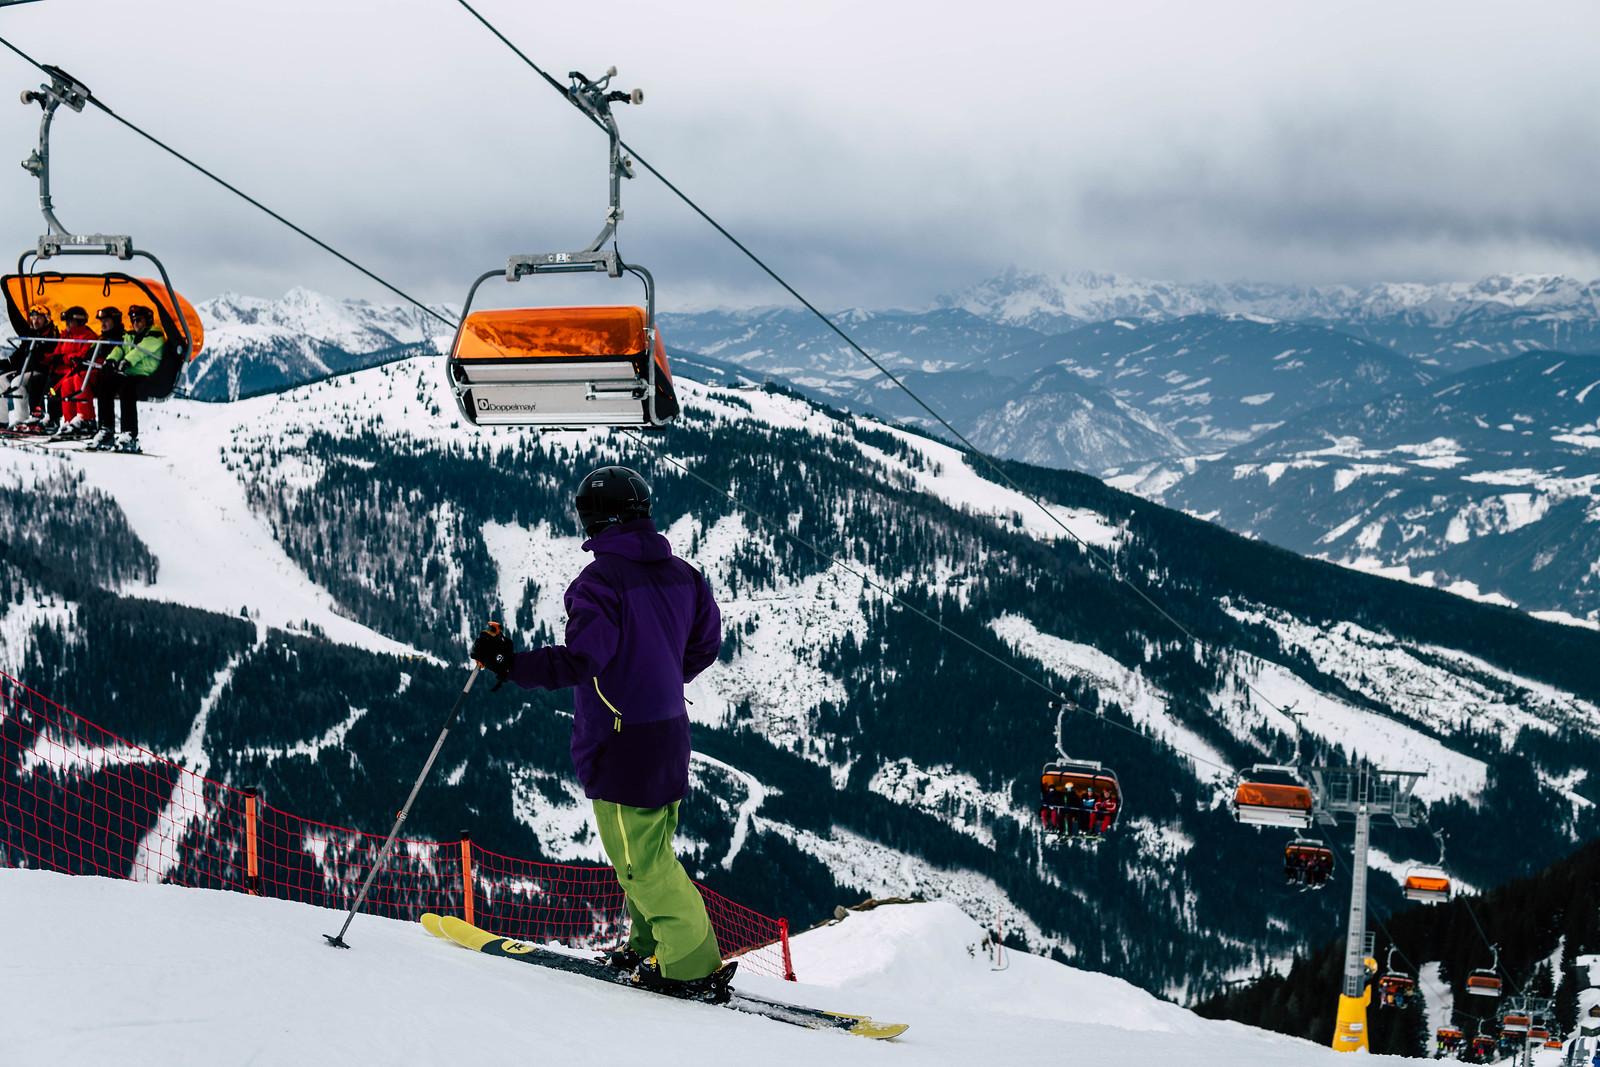 Gipfelbahn – Hauser Kaibling